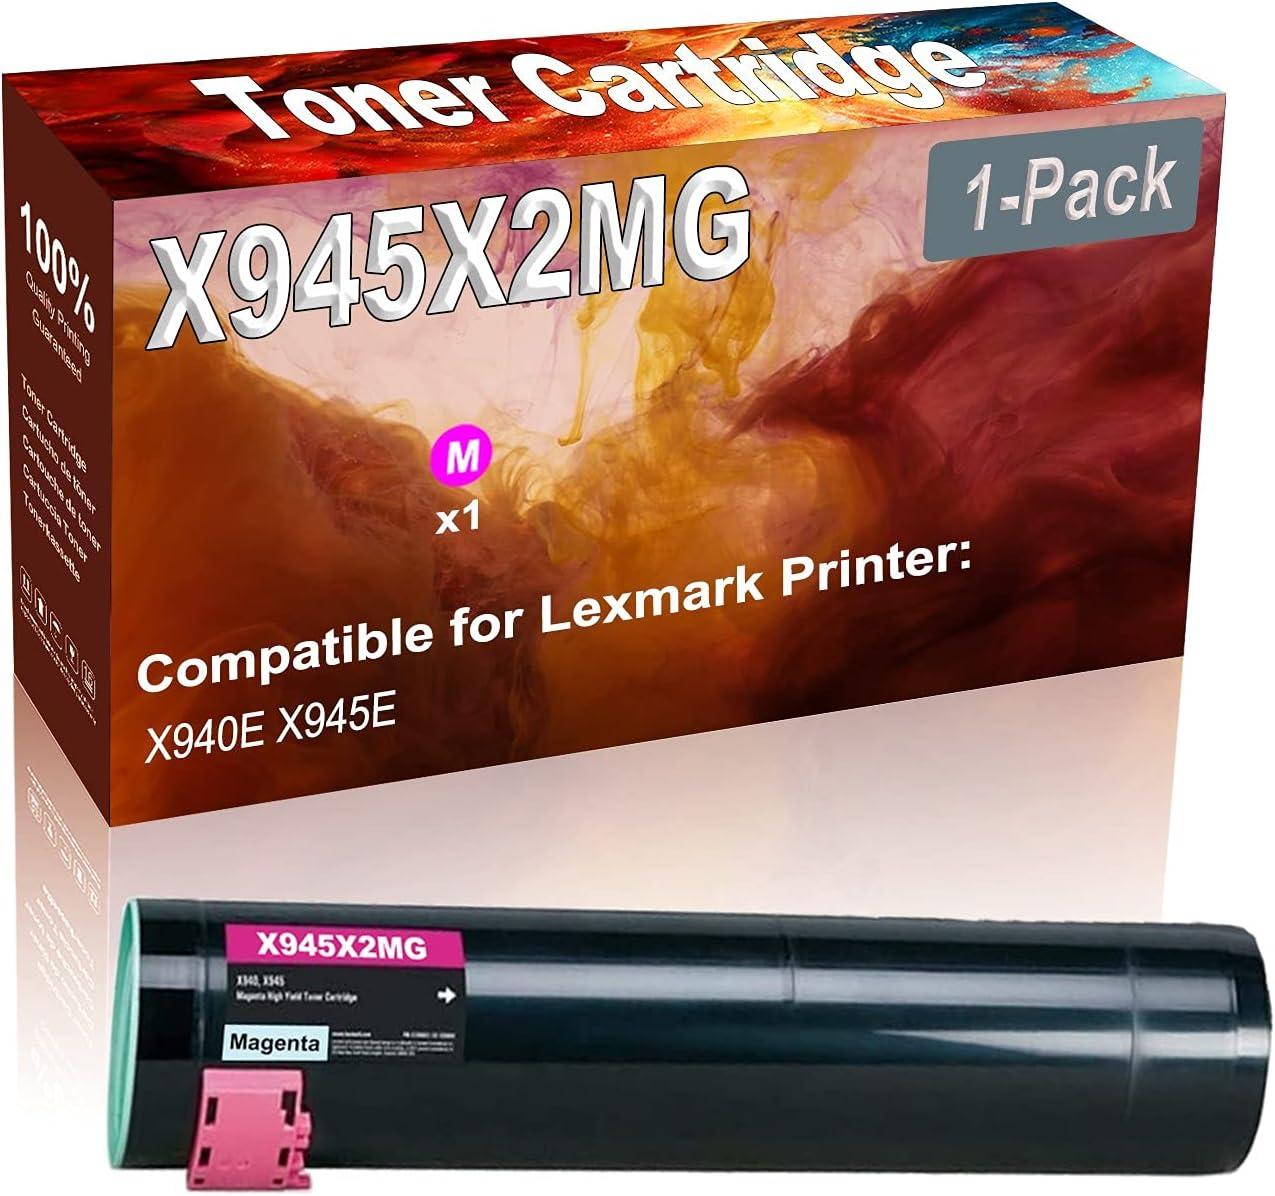 1-Pack (Magenta) Compatible High Yield X945X2MG Printer Toner Cartridge use for Lexmark X940E X945E Printers